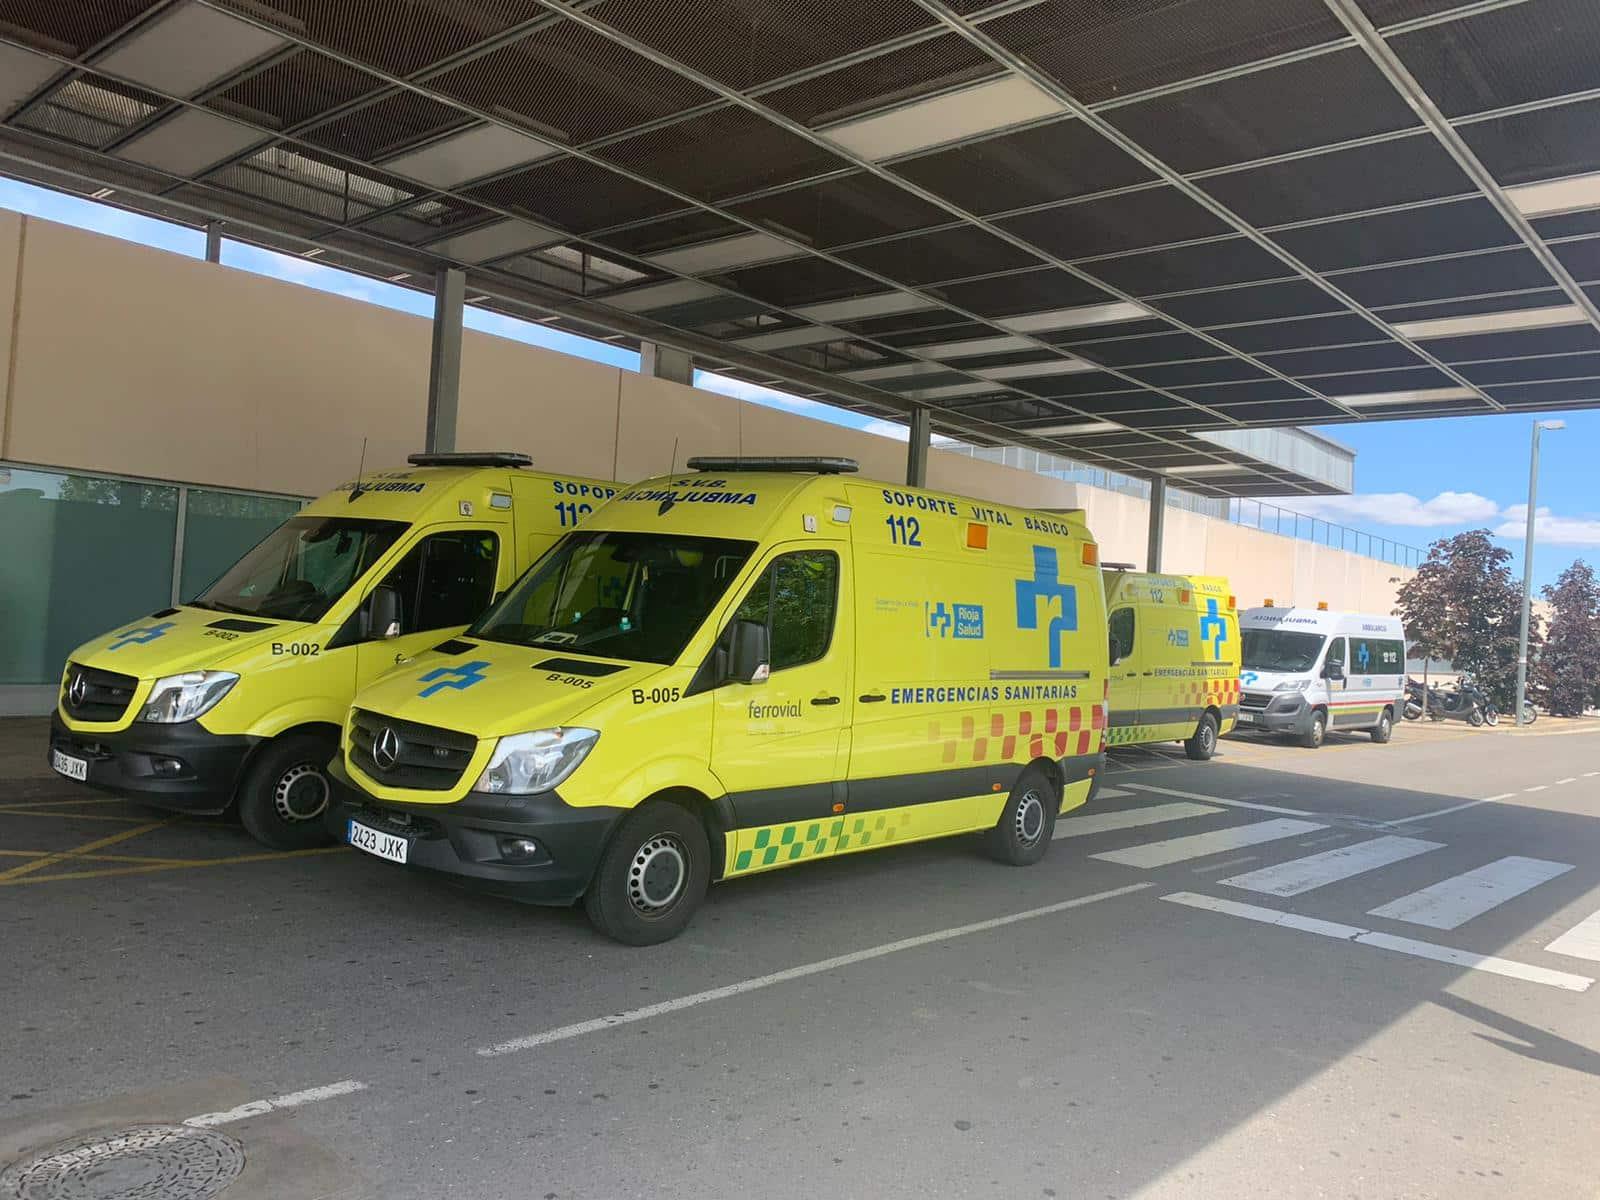 Ambulancias Urgencias